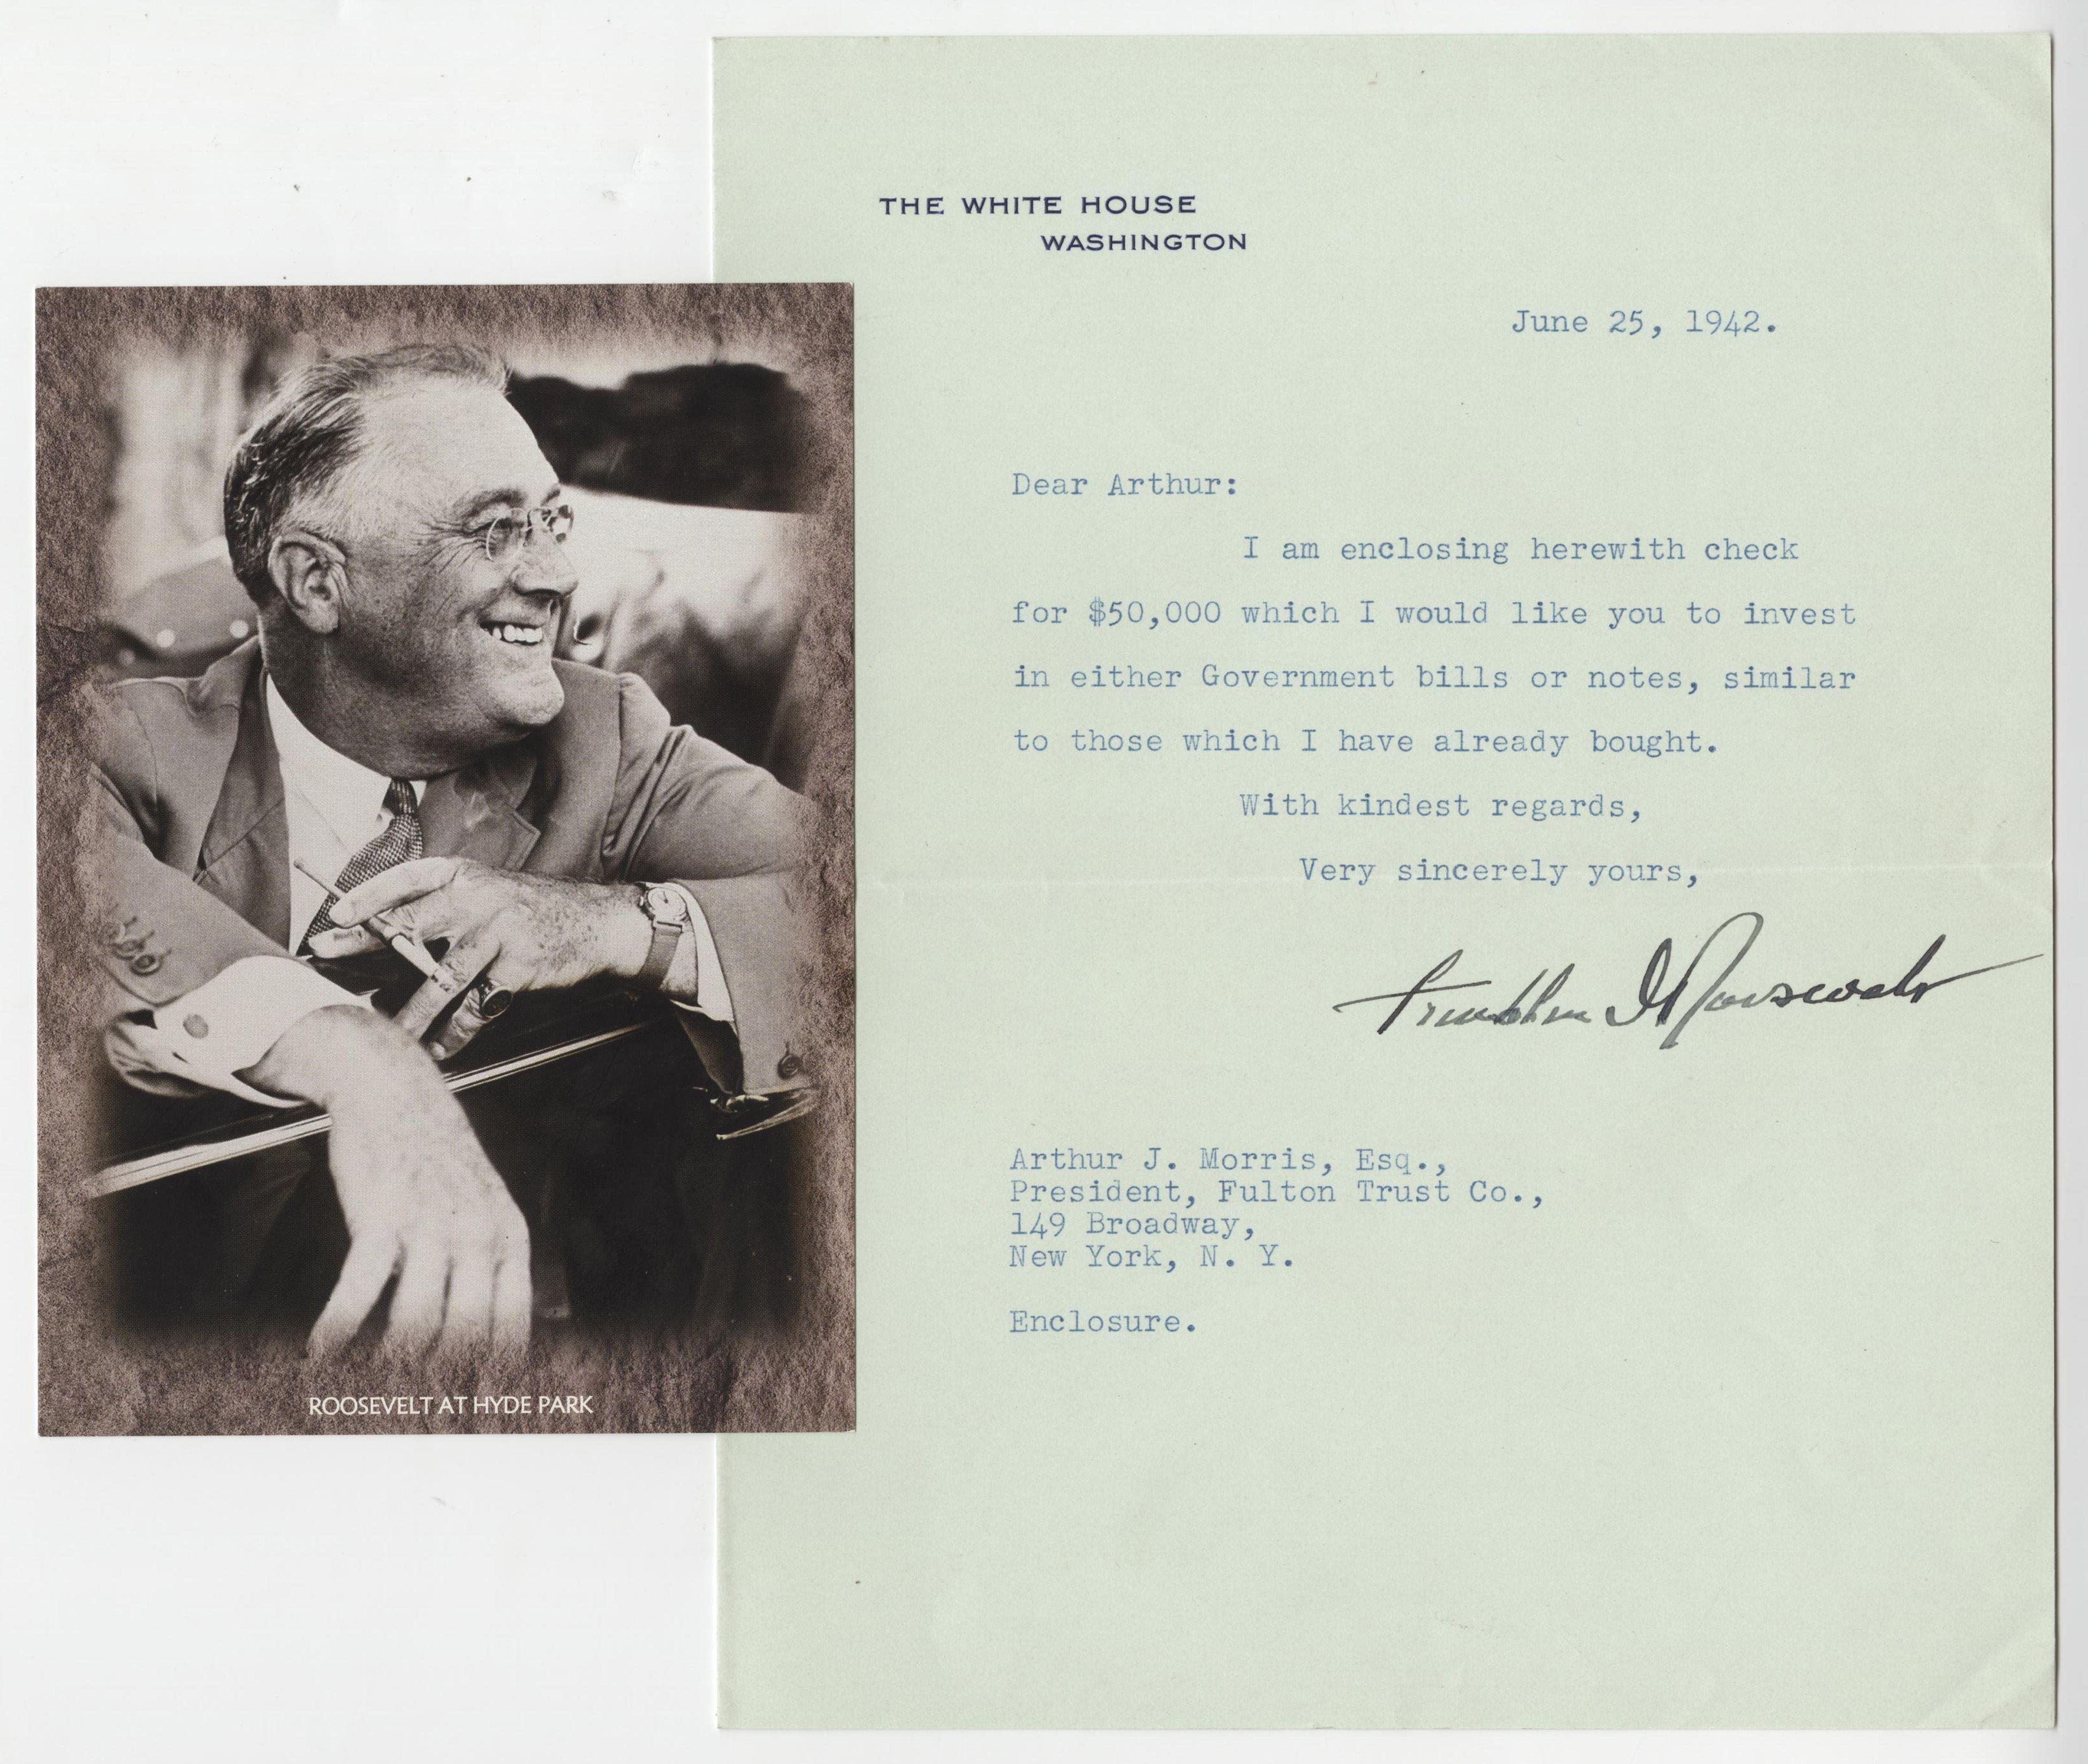 Franklin Roosevelt WWII White House Letter Where he Invests $50k in Gov't. Bonds